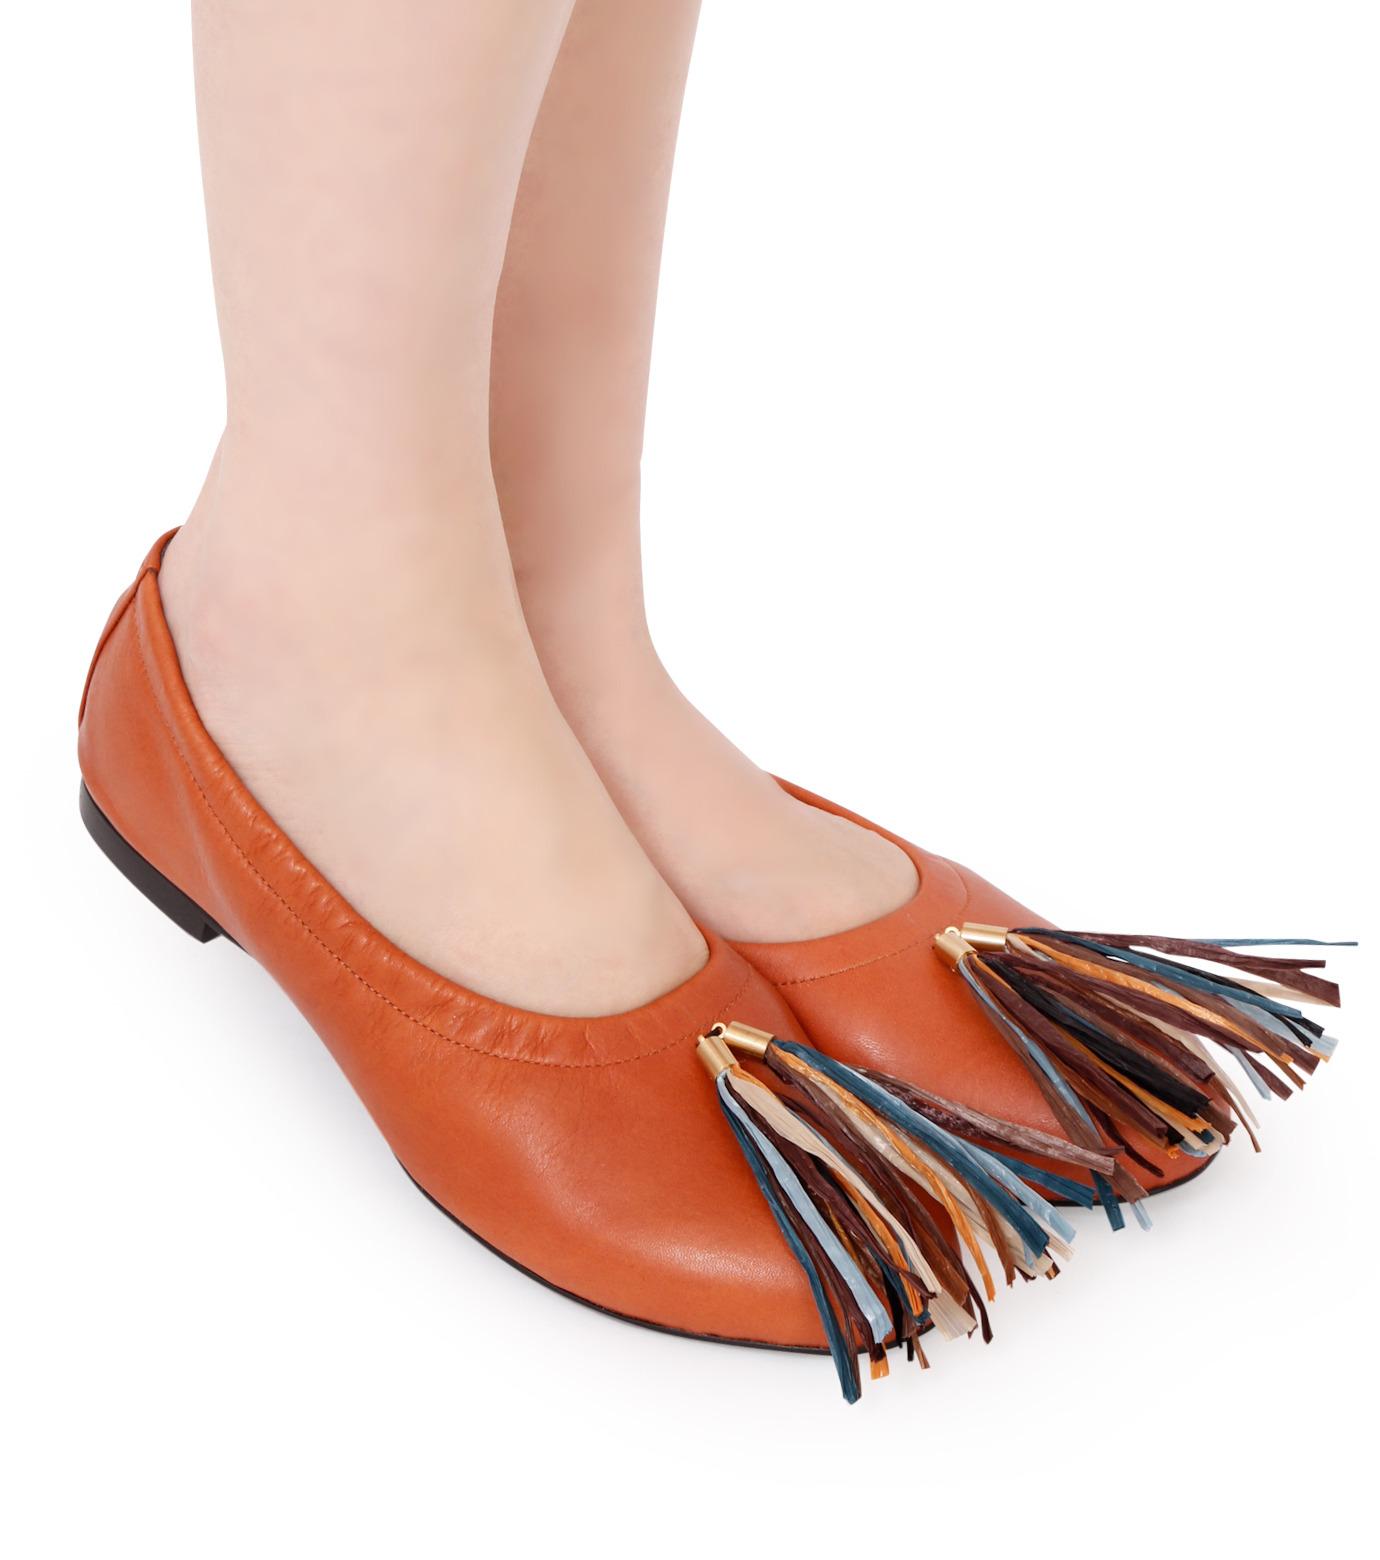 PIPPICHIC(ピッピシック)のballet shoes-DARK BROWN(シューズ/shoes)-PP16BALLET19-43 拡大詳細画像5